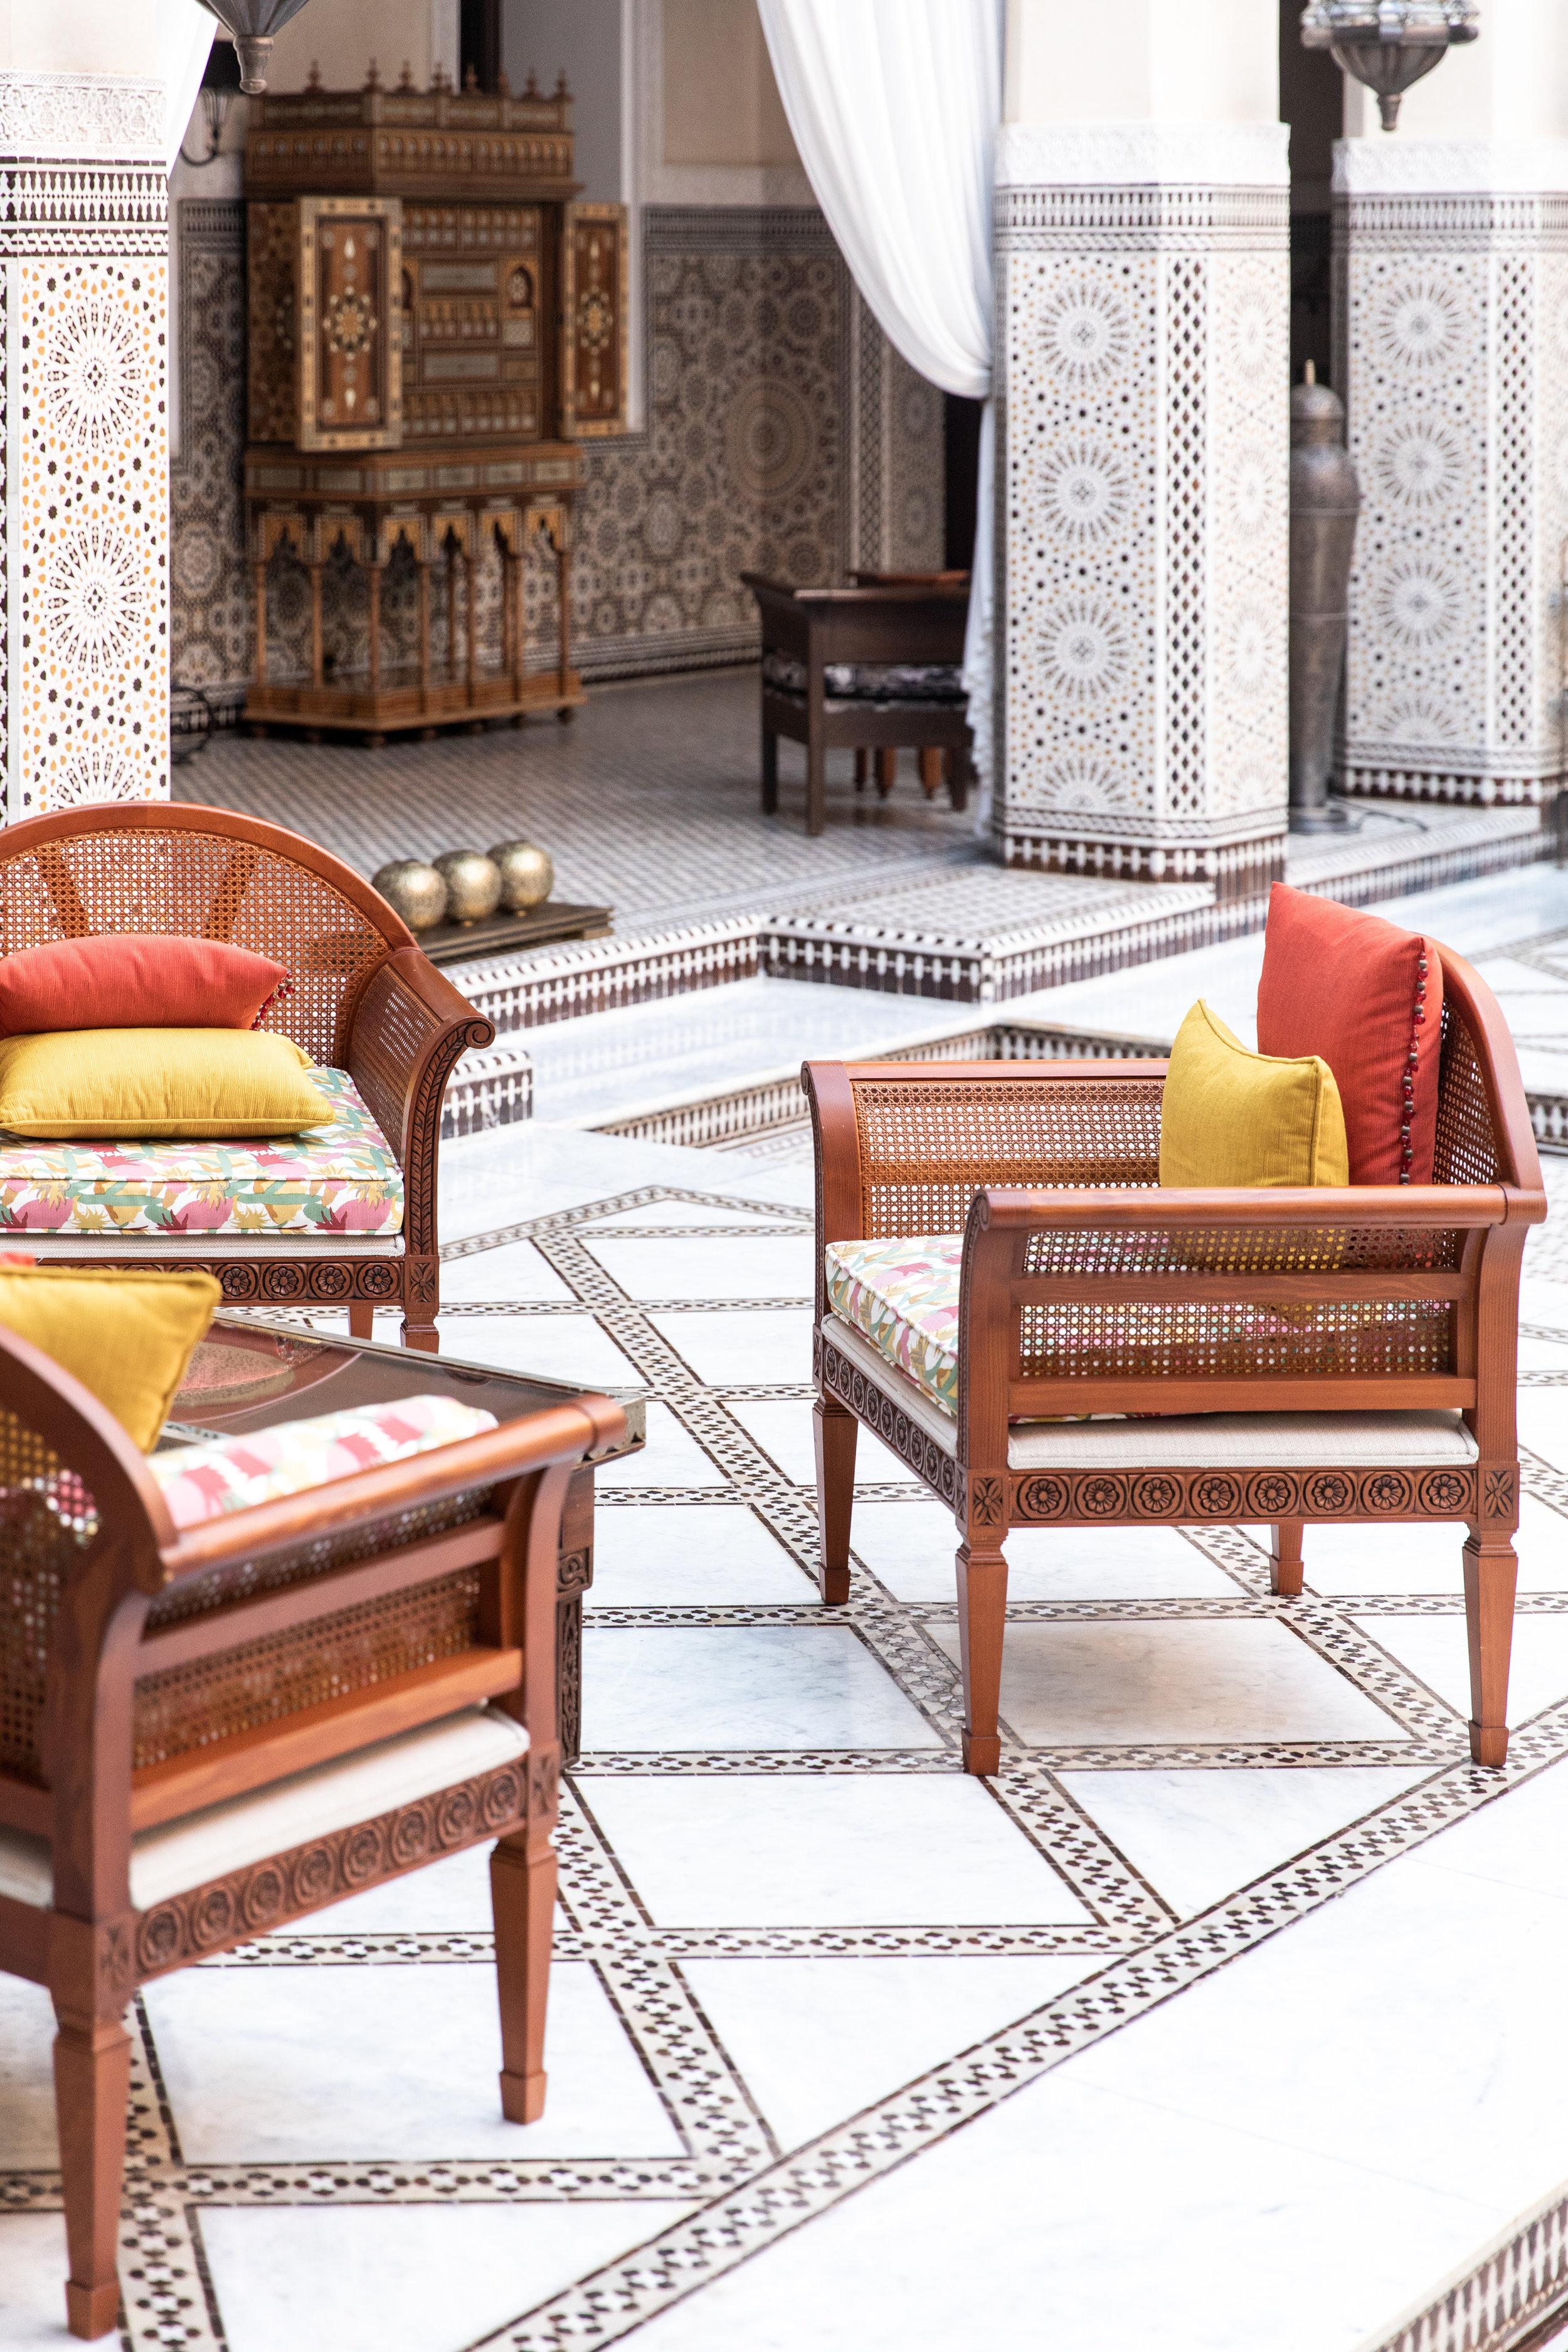 Morocco-3114.jpg